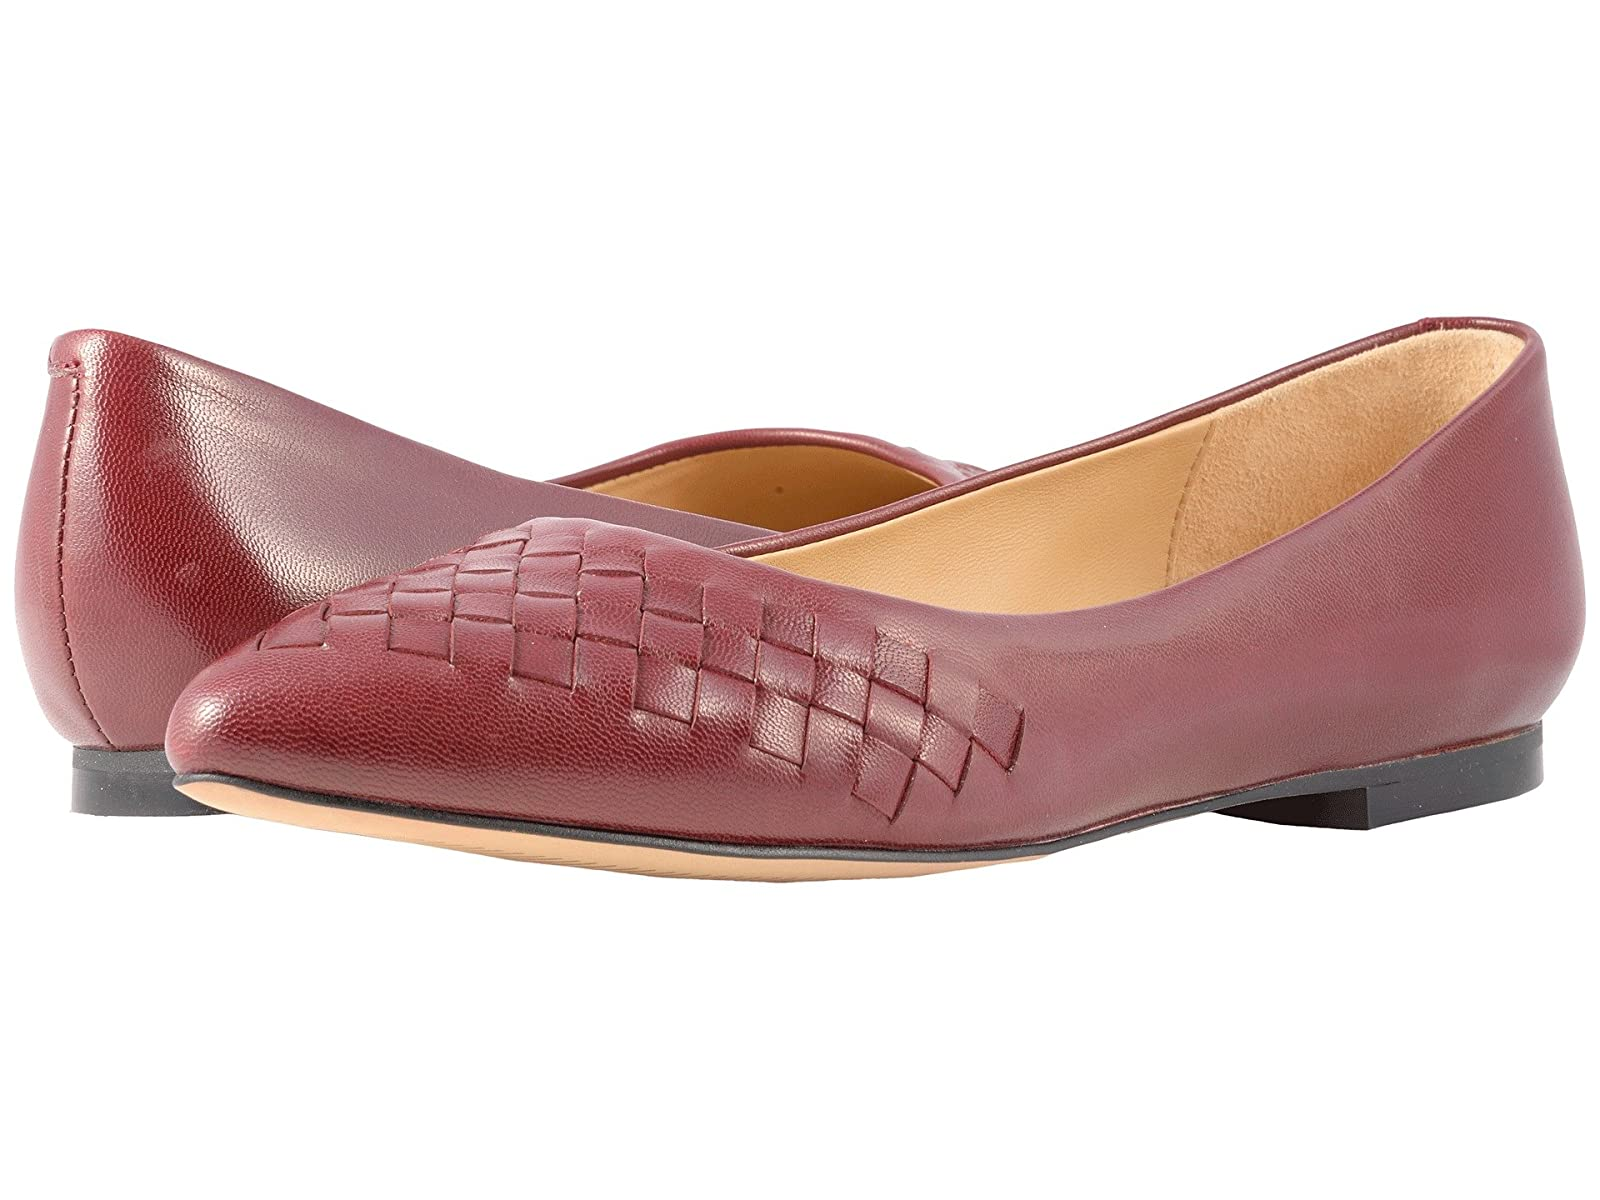 Trotters Estee WovenAtmospheric grades have affordable shoes